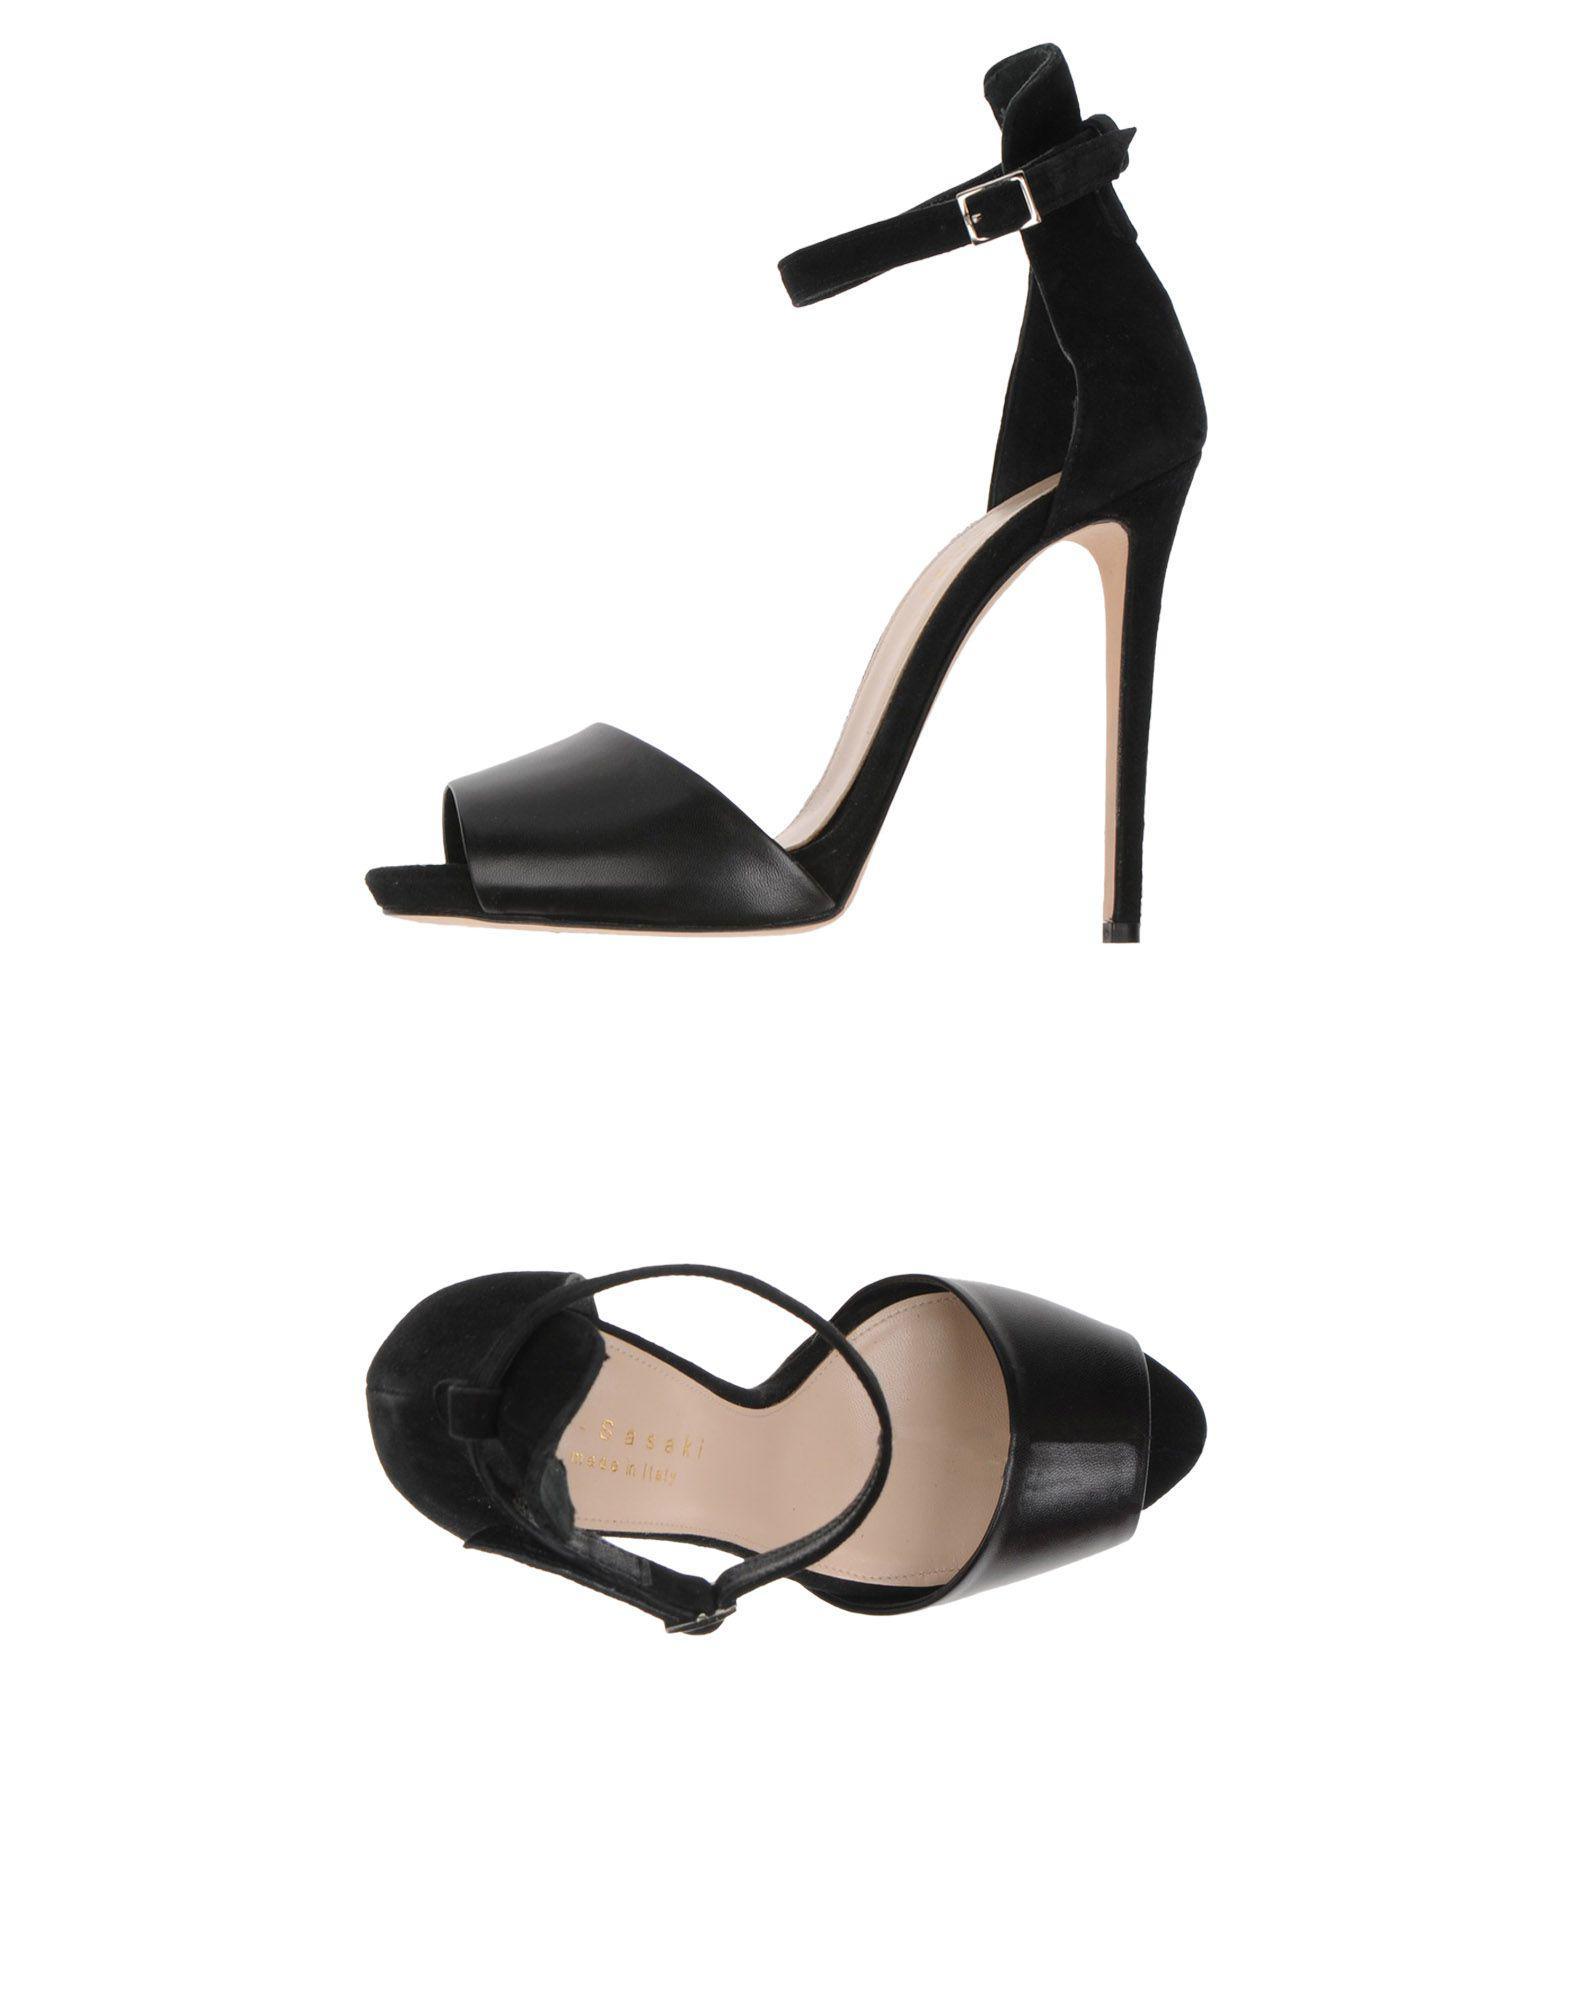 MEG SASAKI Sandals Black Women